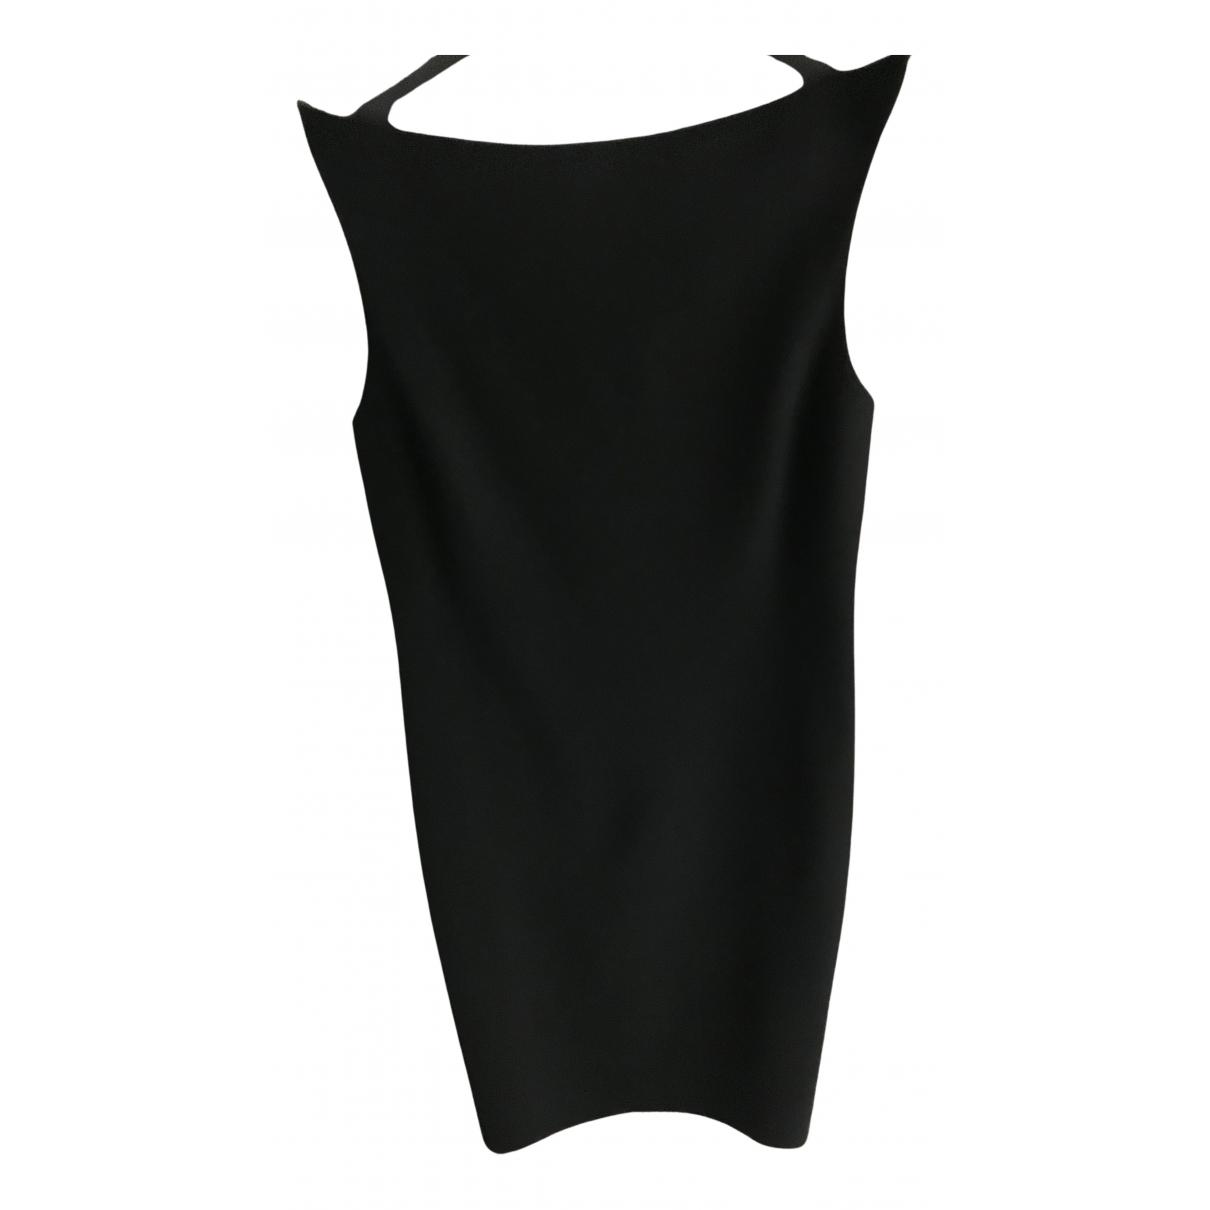 Jil Sander N Black Wool dress for Women M International